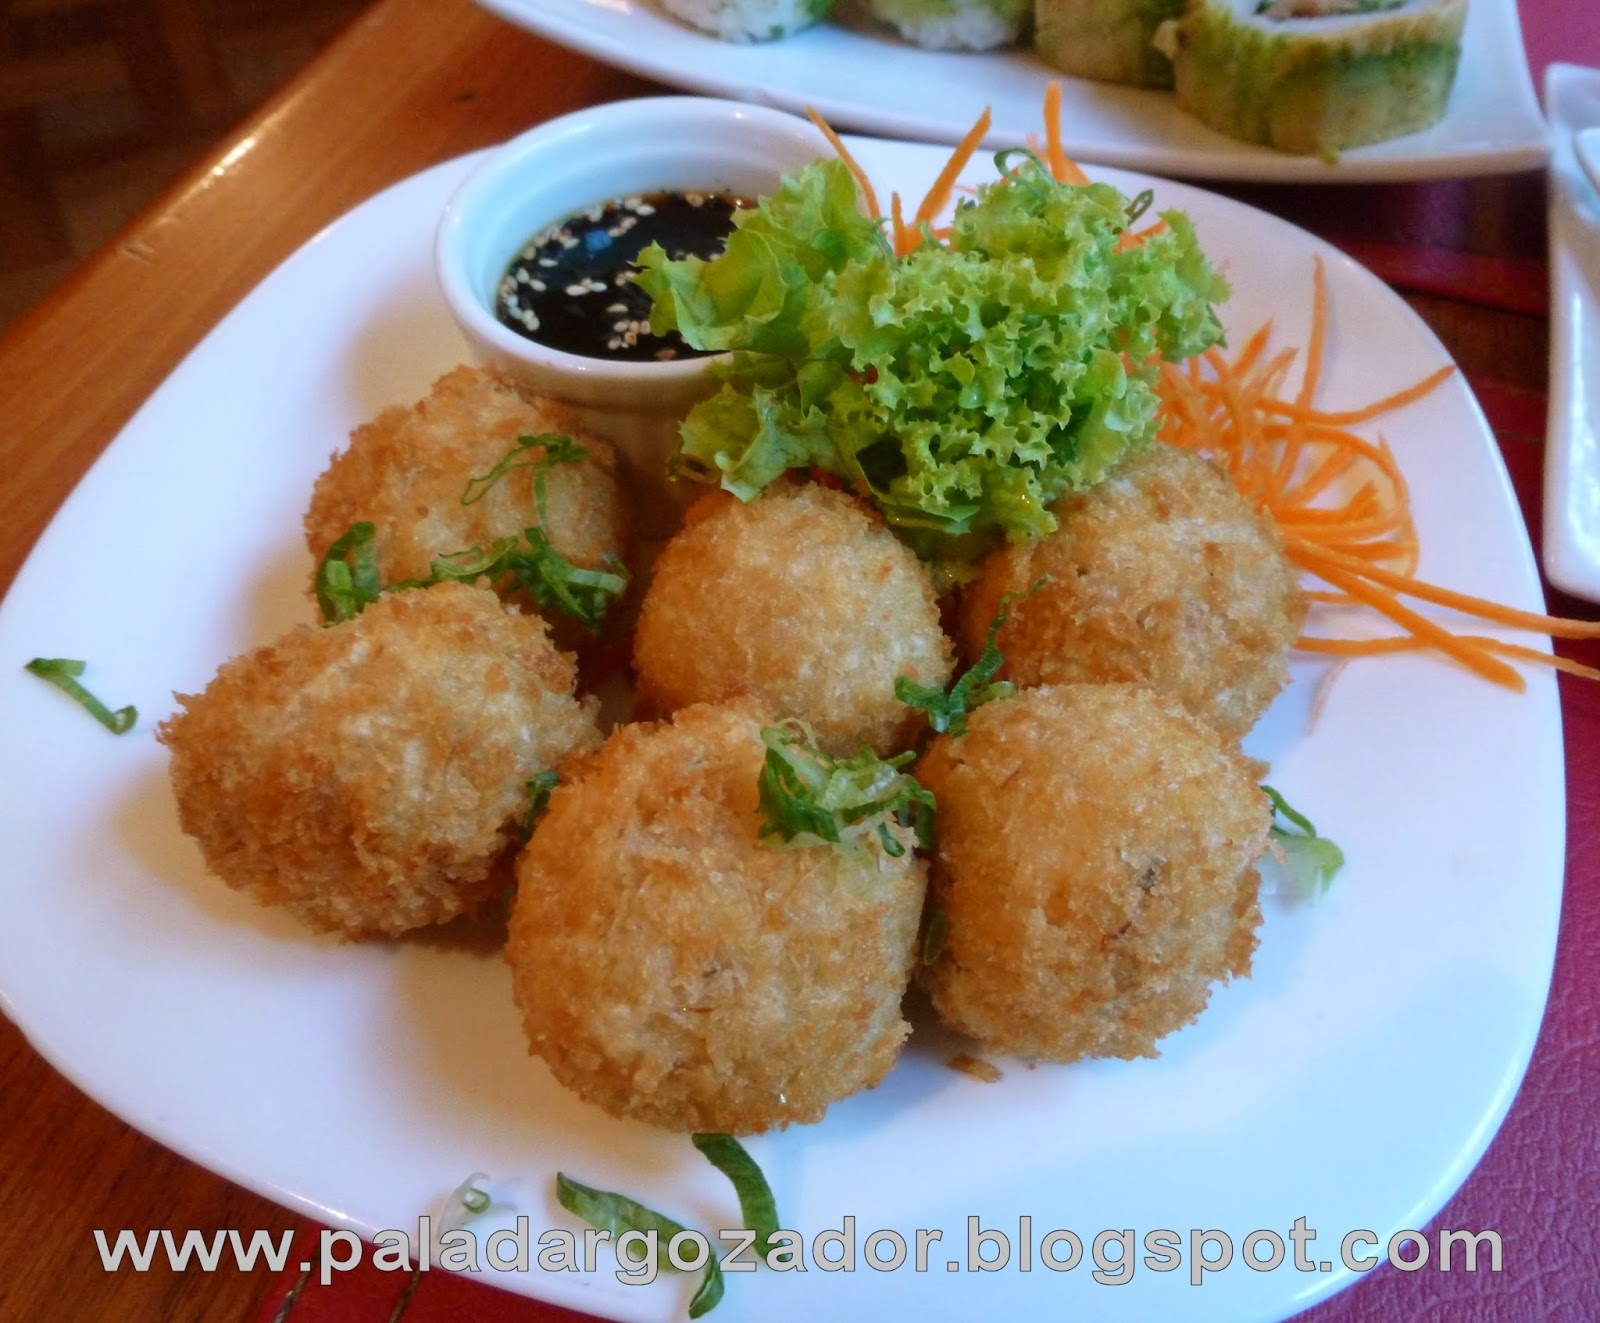 kudasaru sushi crab balls